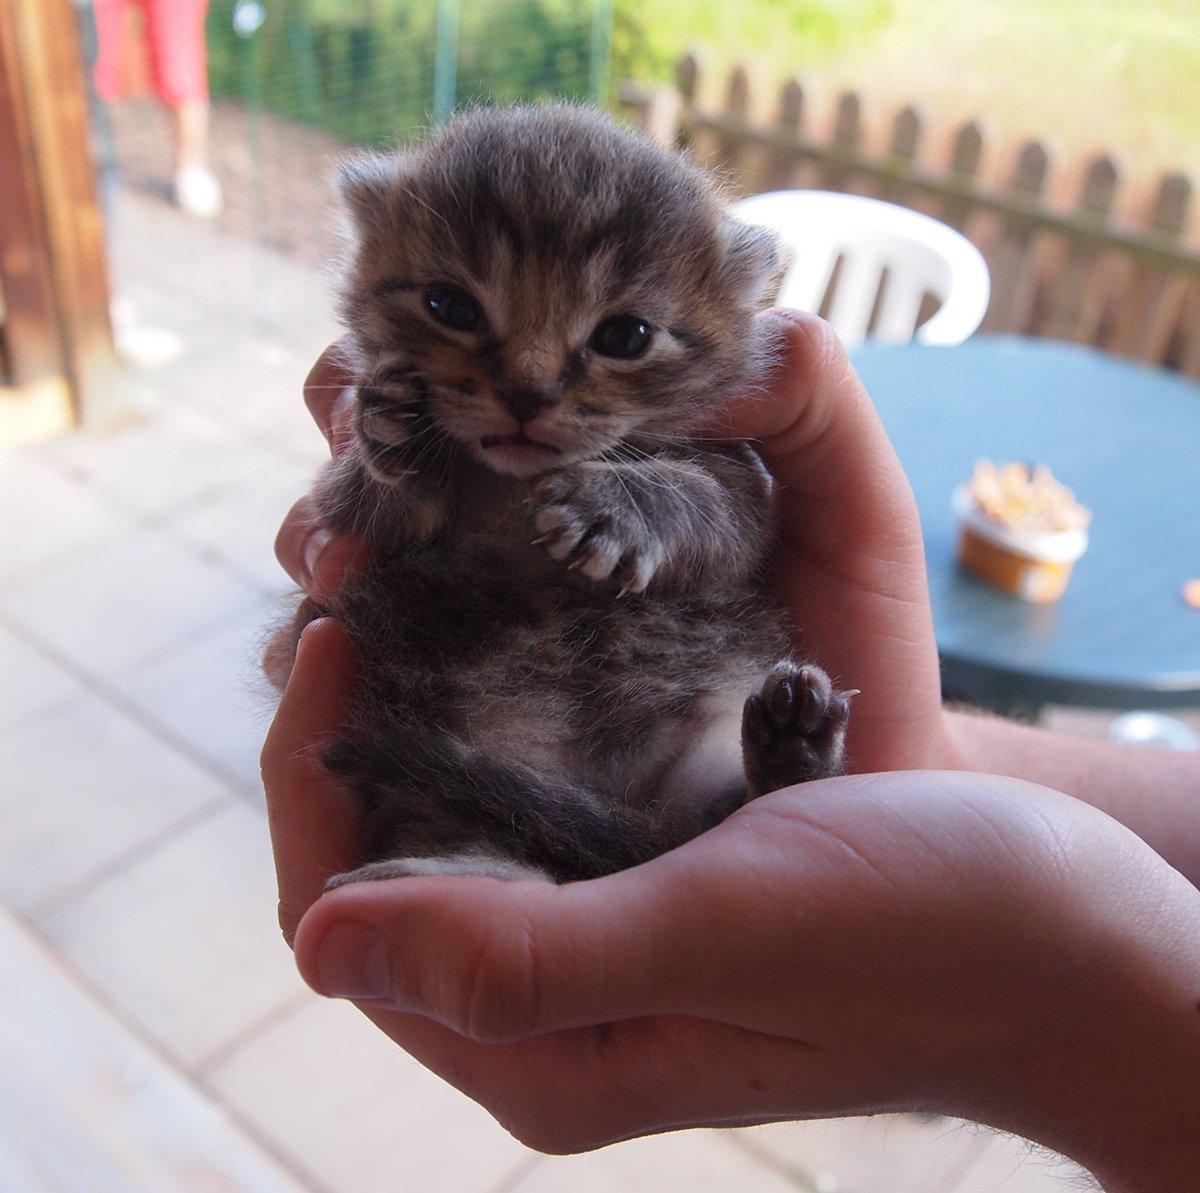 Baby porcupine :) | Weird but cute baby animals ...  |Weird Cute Animals